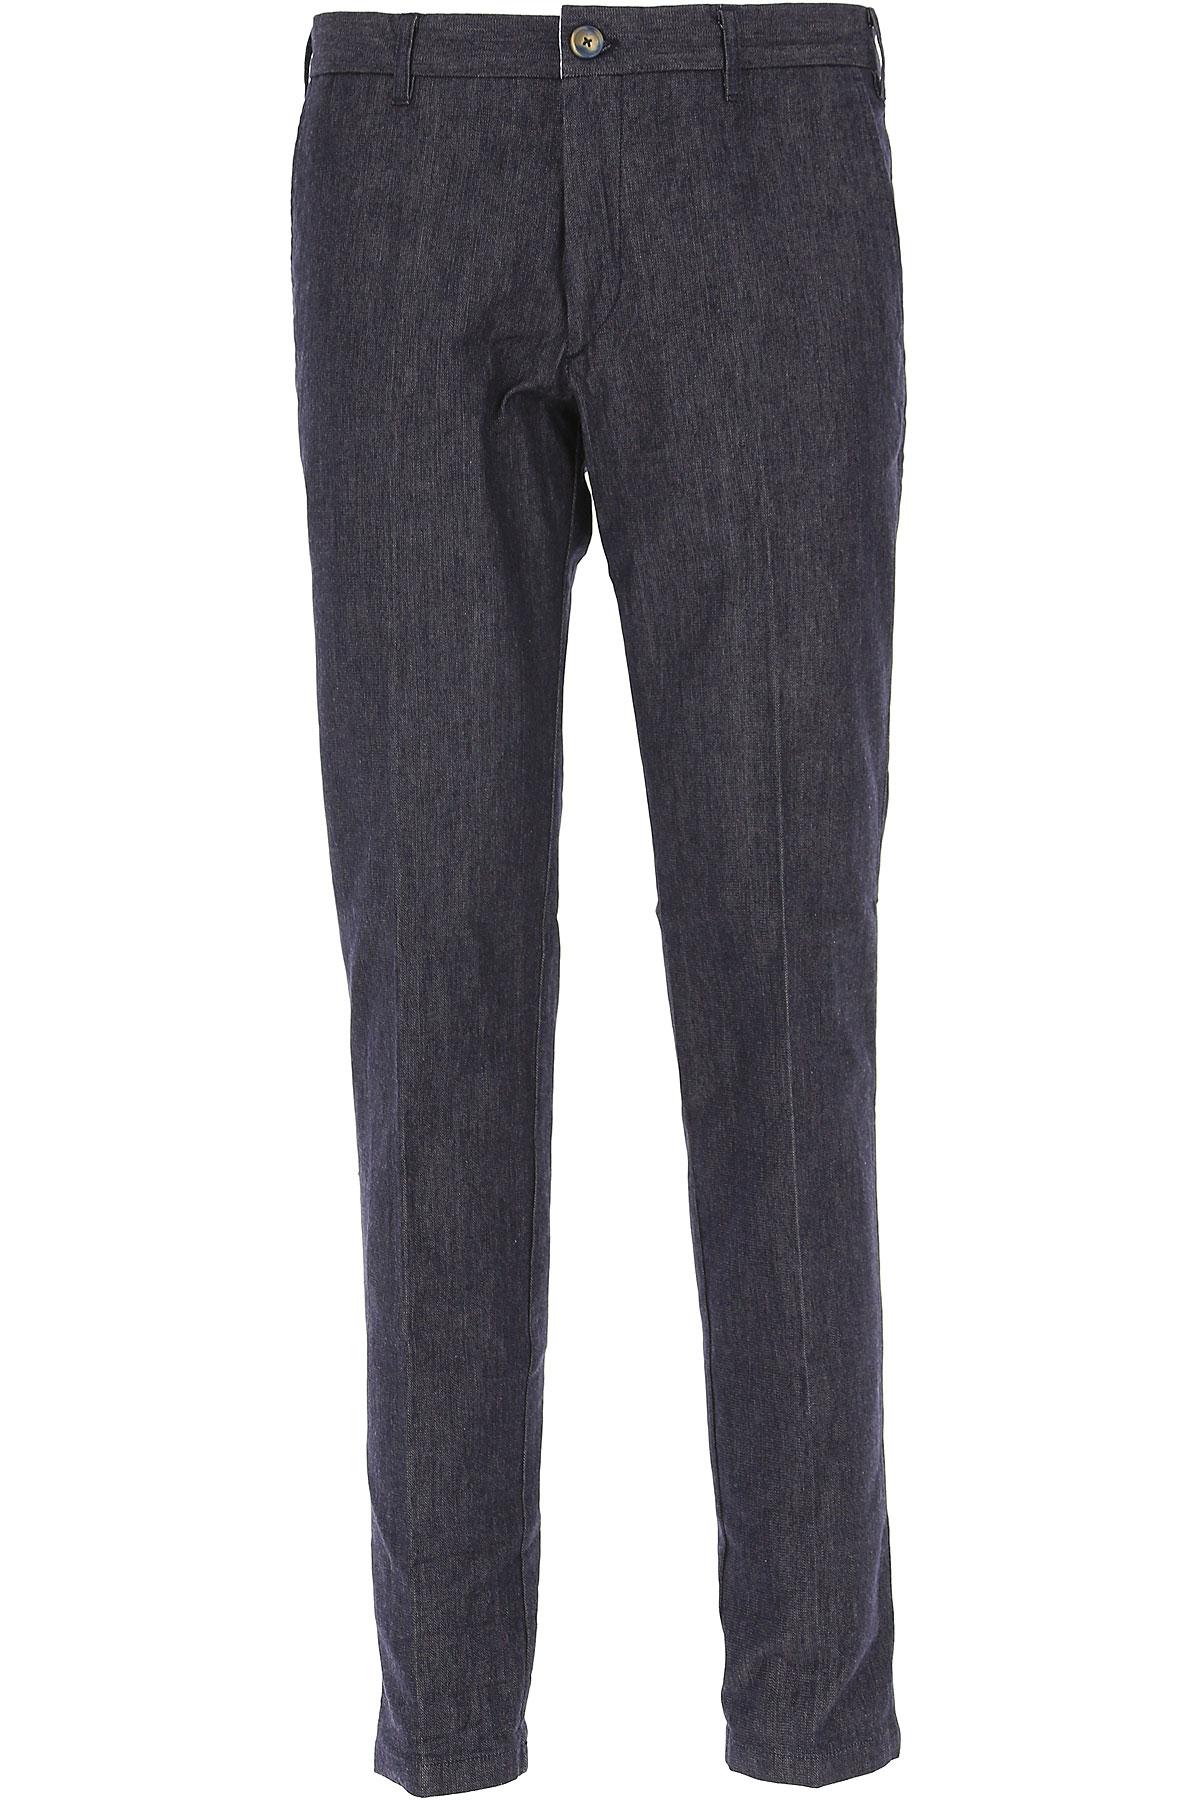 Image of J.W. Brine Jeans, dark Denim, Denim, 2017, 30 34 36 38 40